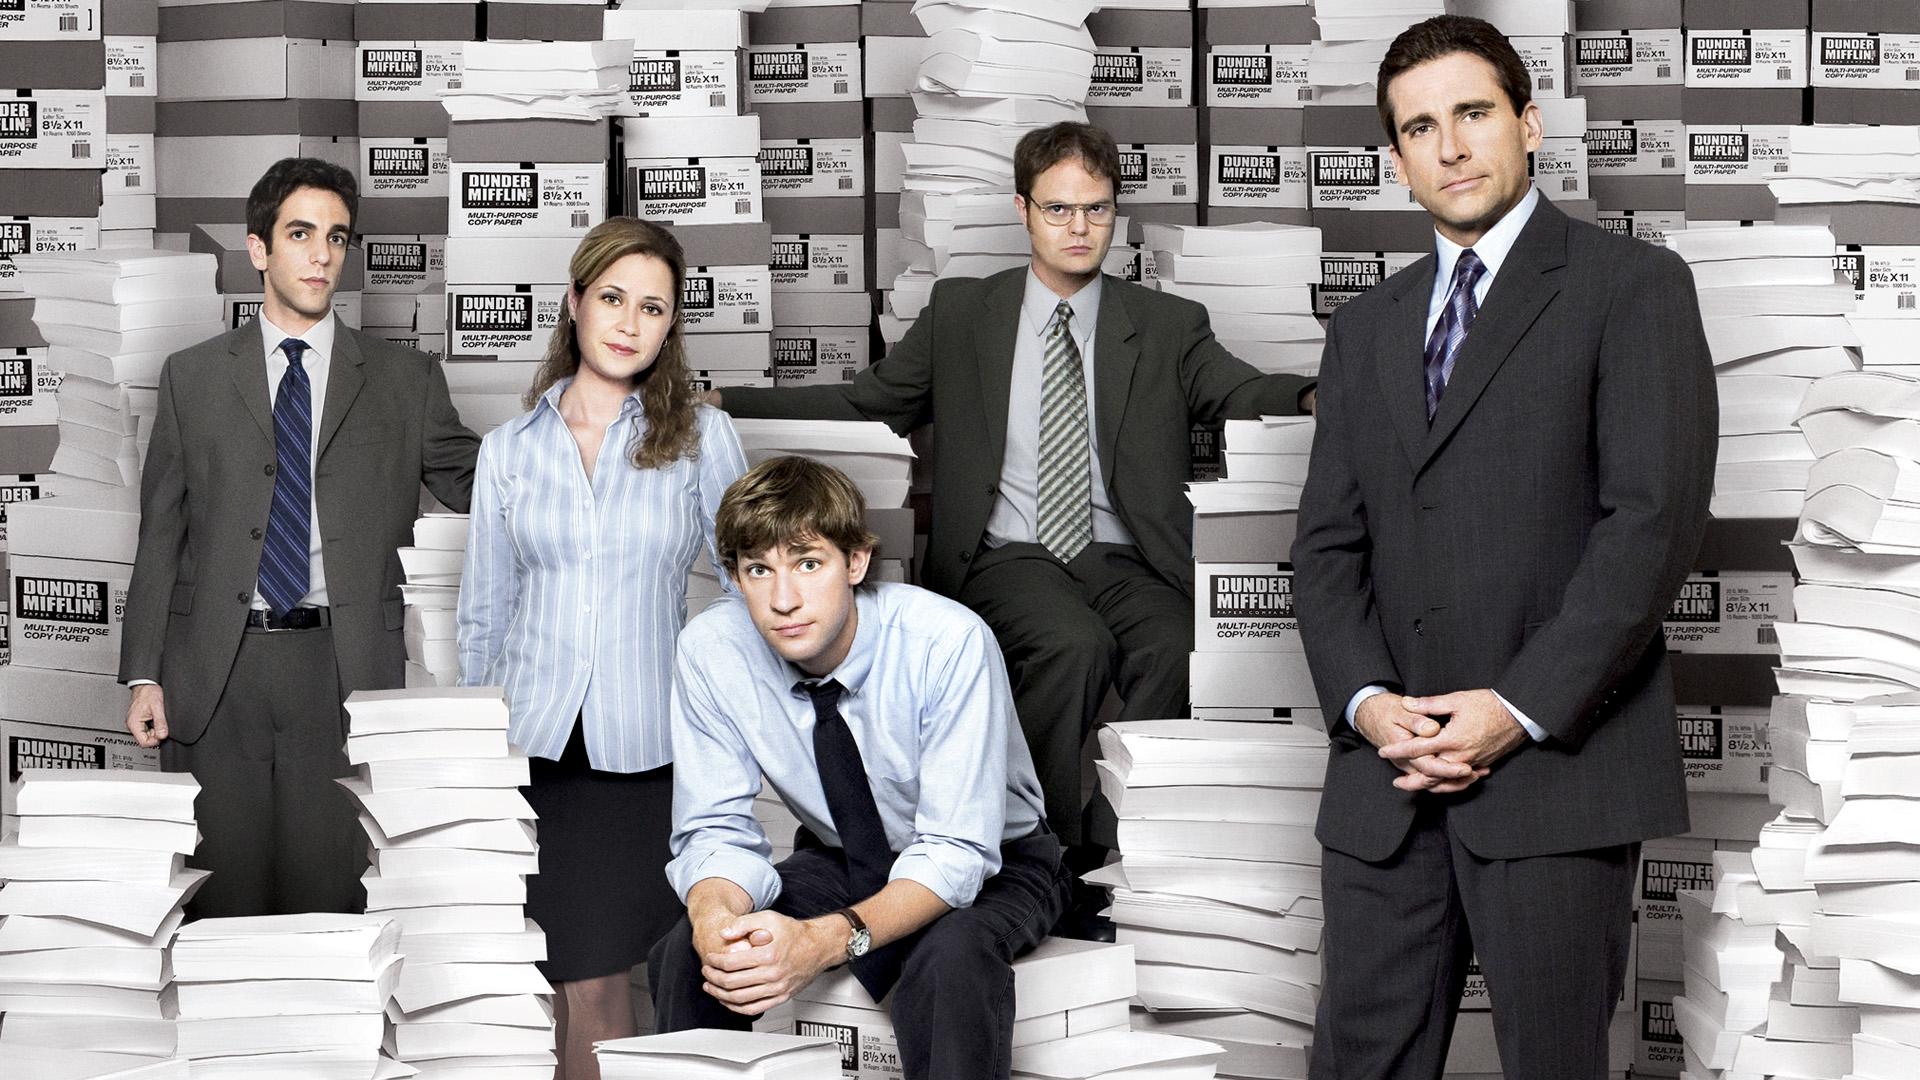 Tv Series The Office Wallpaper Tv Fanart Wallpapers | New ... - photo#44